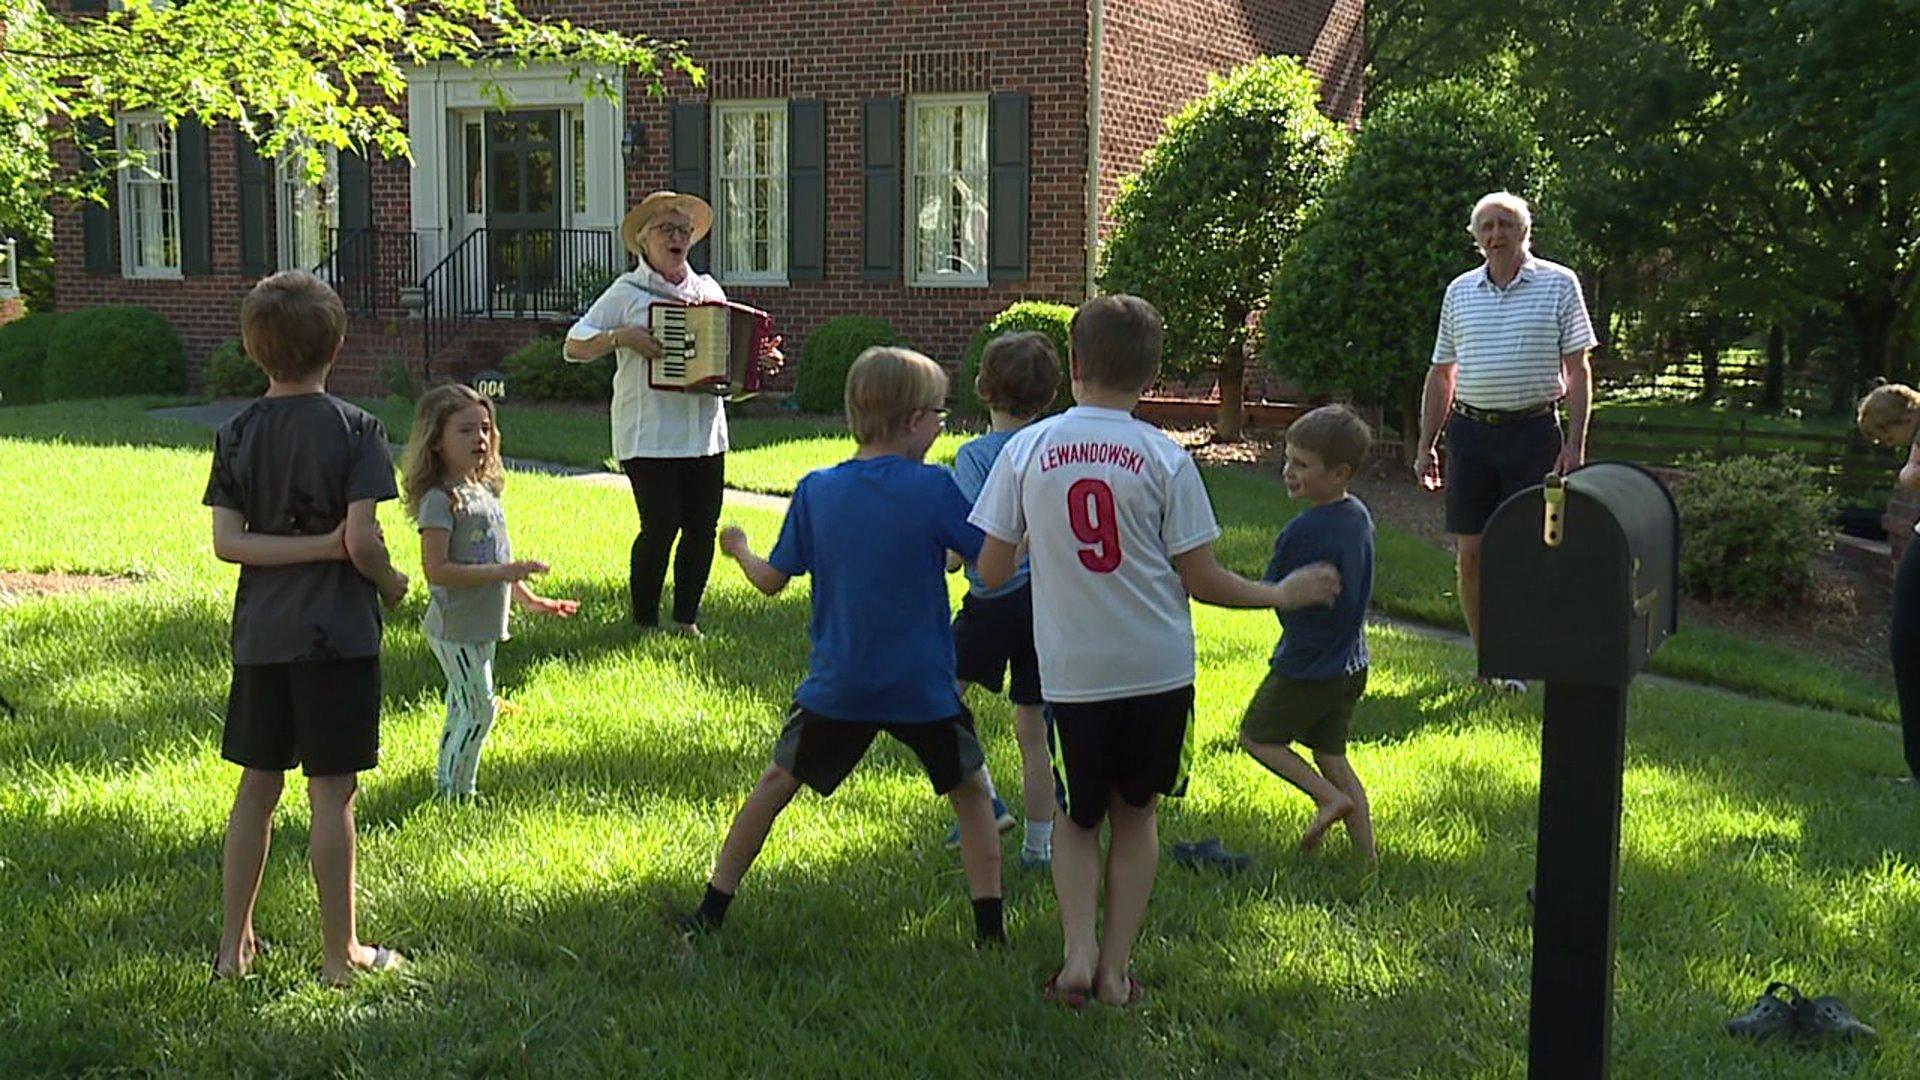 Winston-Salem couple entertains neighborhood children with musical performances